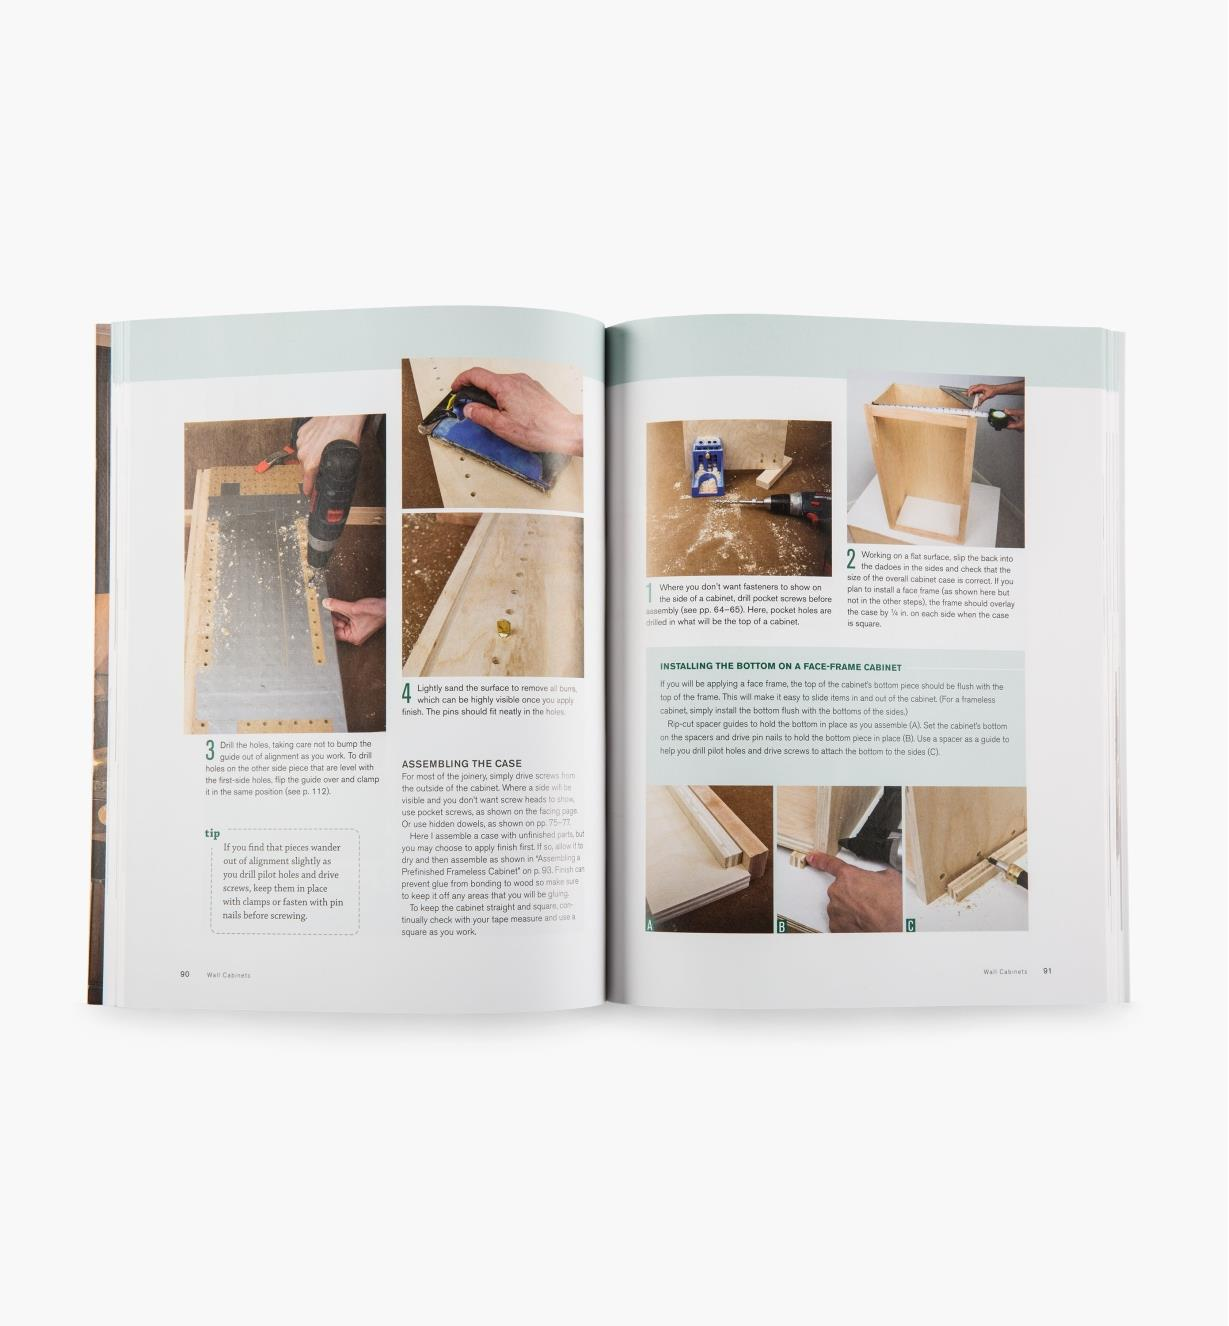 73L0381 - Building Kitchen Cabinets and Bathroom Vanities